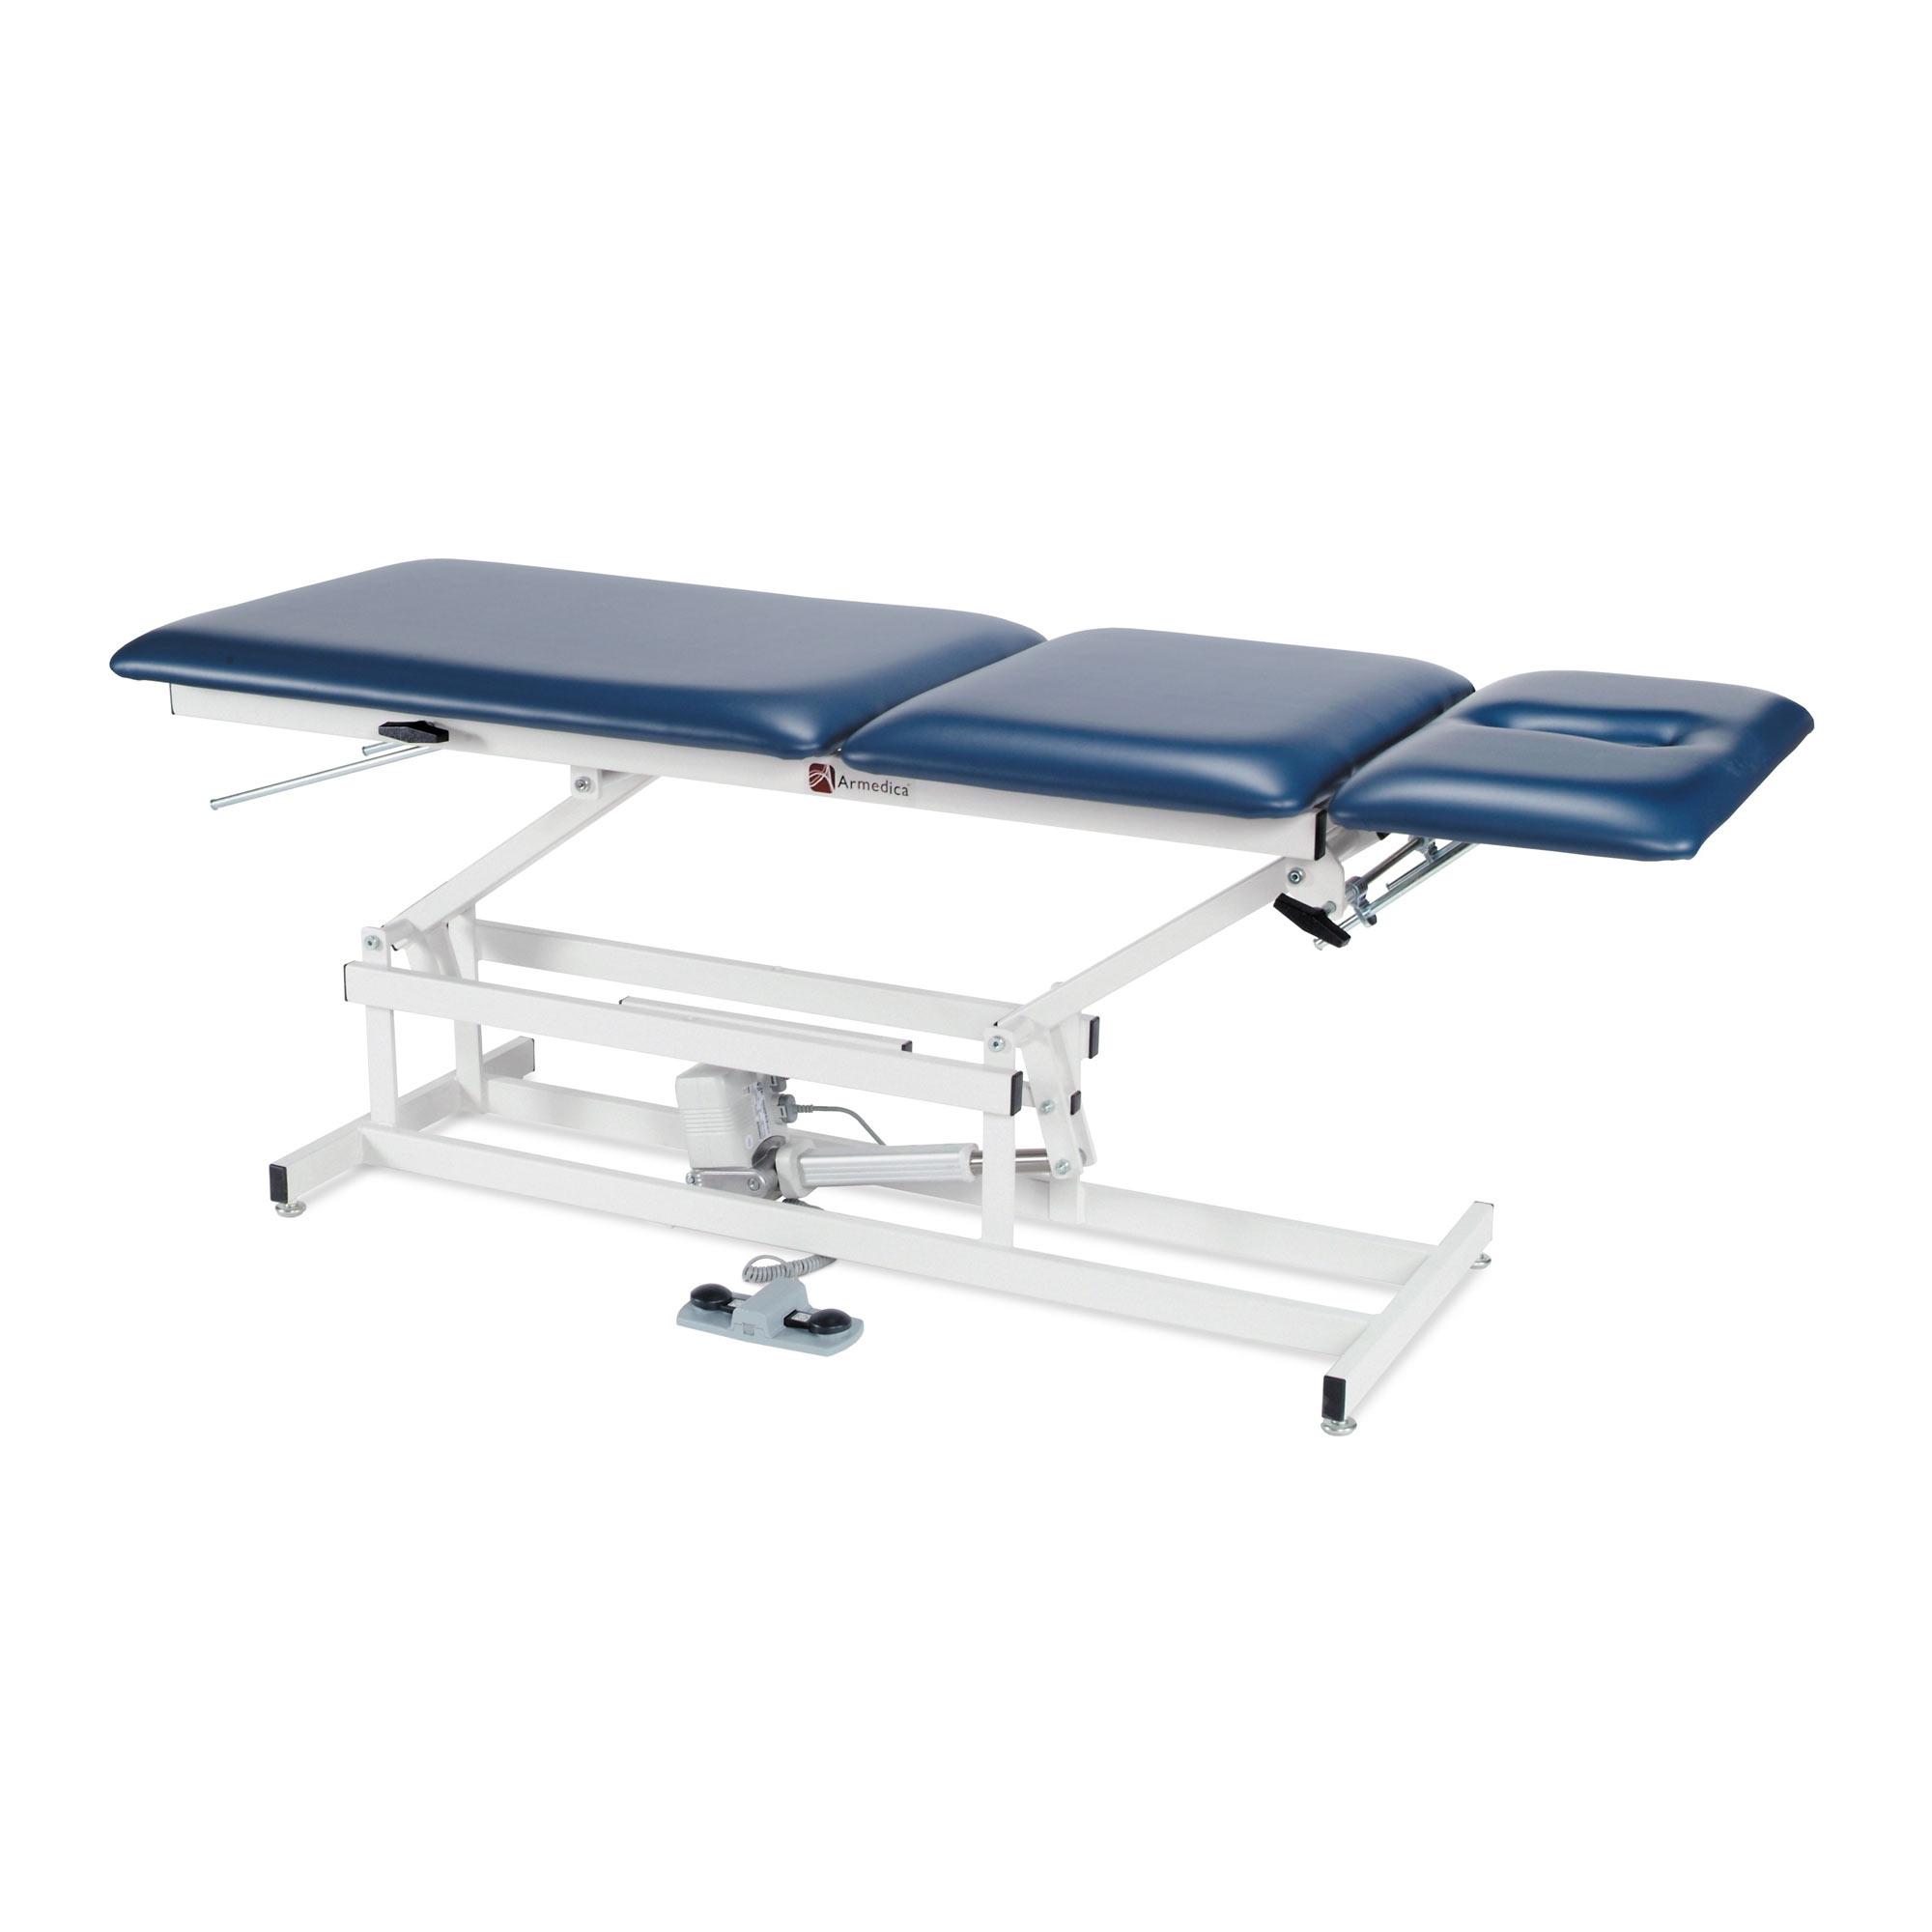 Armedica AM-340 bariatric treatment table